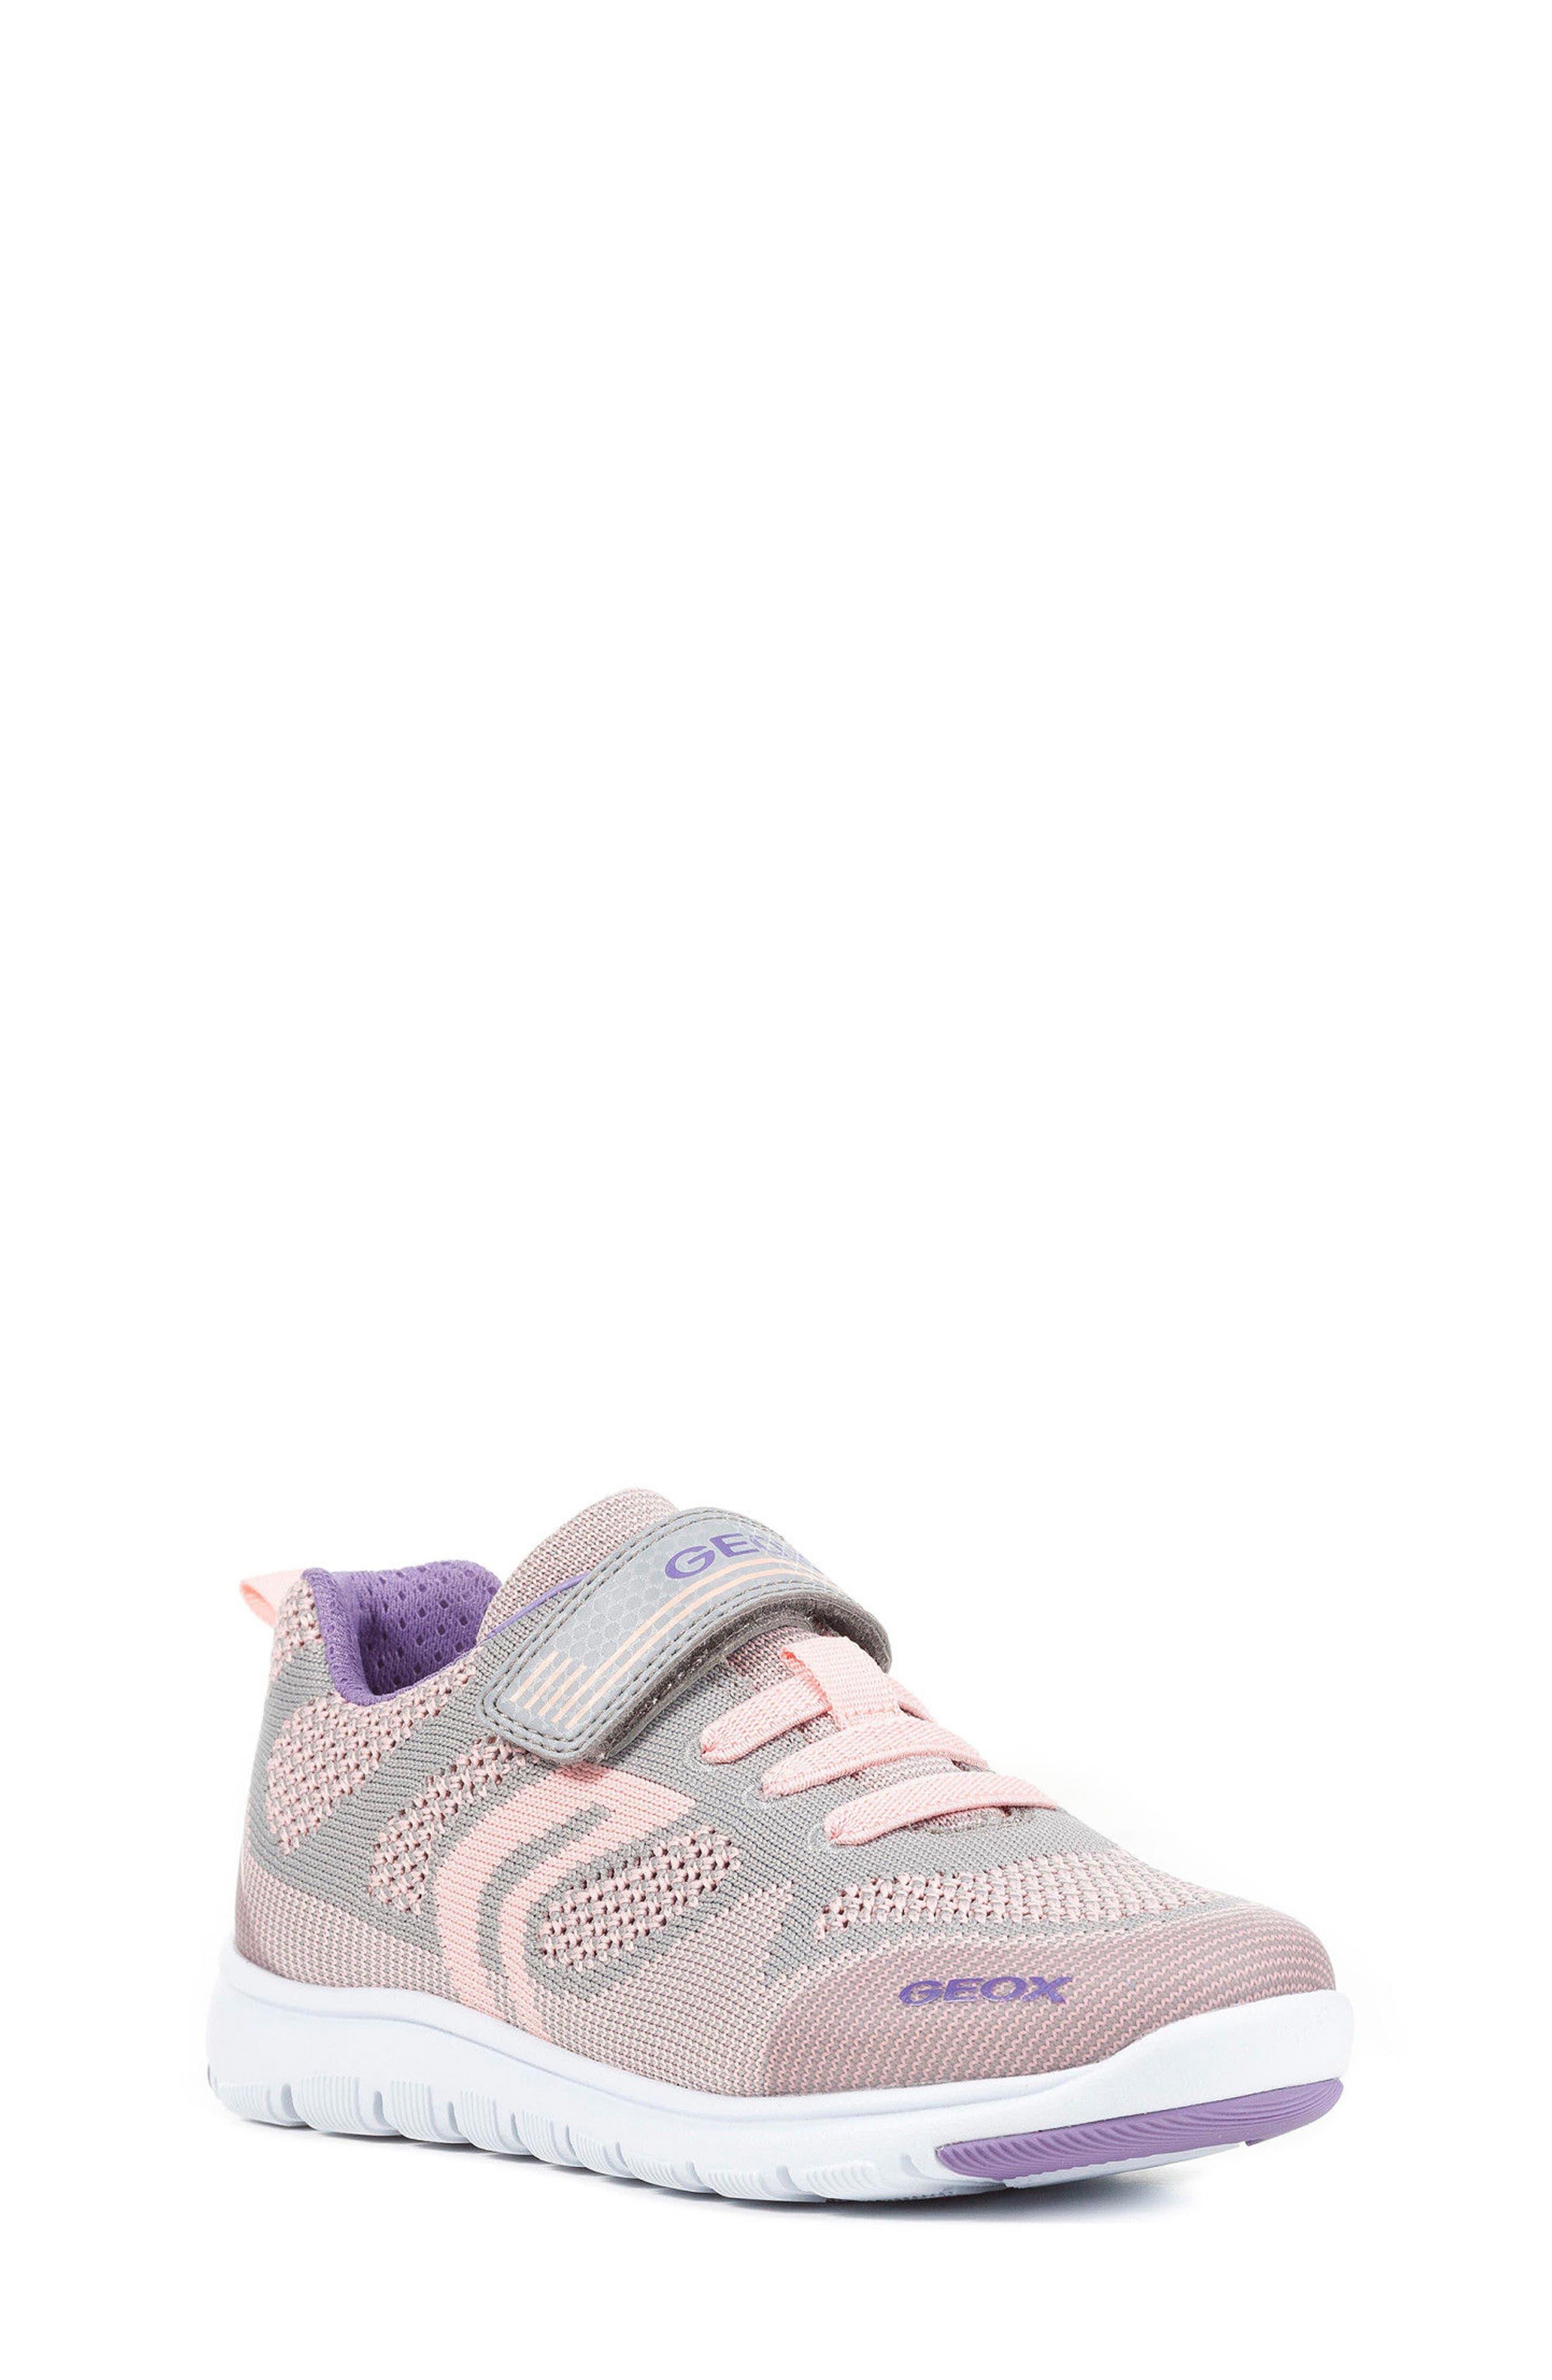 Alternate Image 1 Selected - Geox Xunday Low Top Woven Sneaker (Toddler, Little Kid & Big Kid)